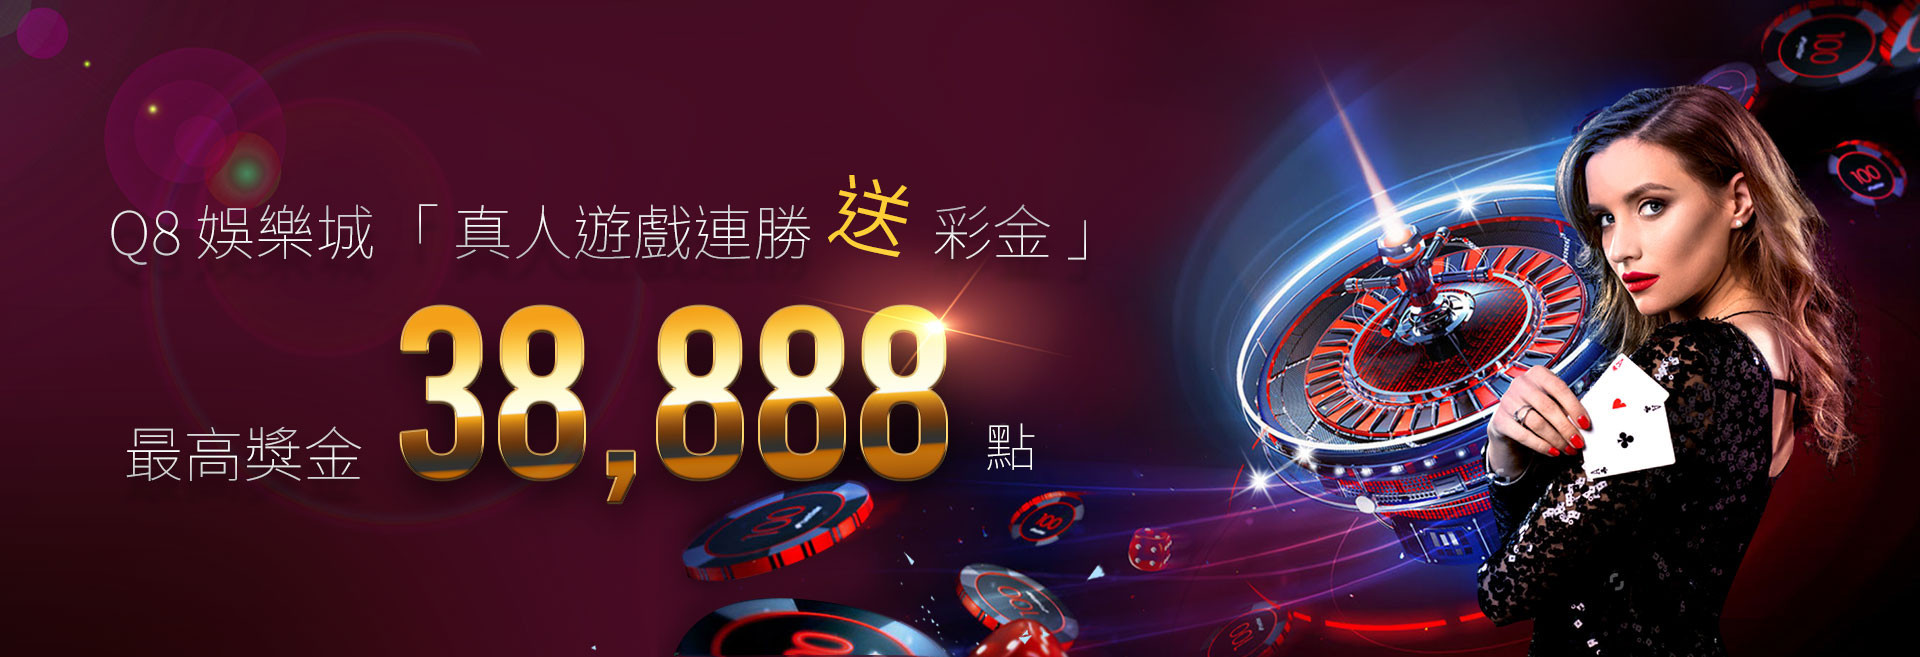 Q8娛樂城真人視訊連勝送彩金達標,無須洗碼38888等你來拿!